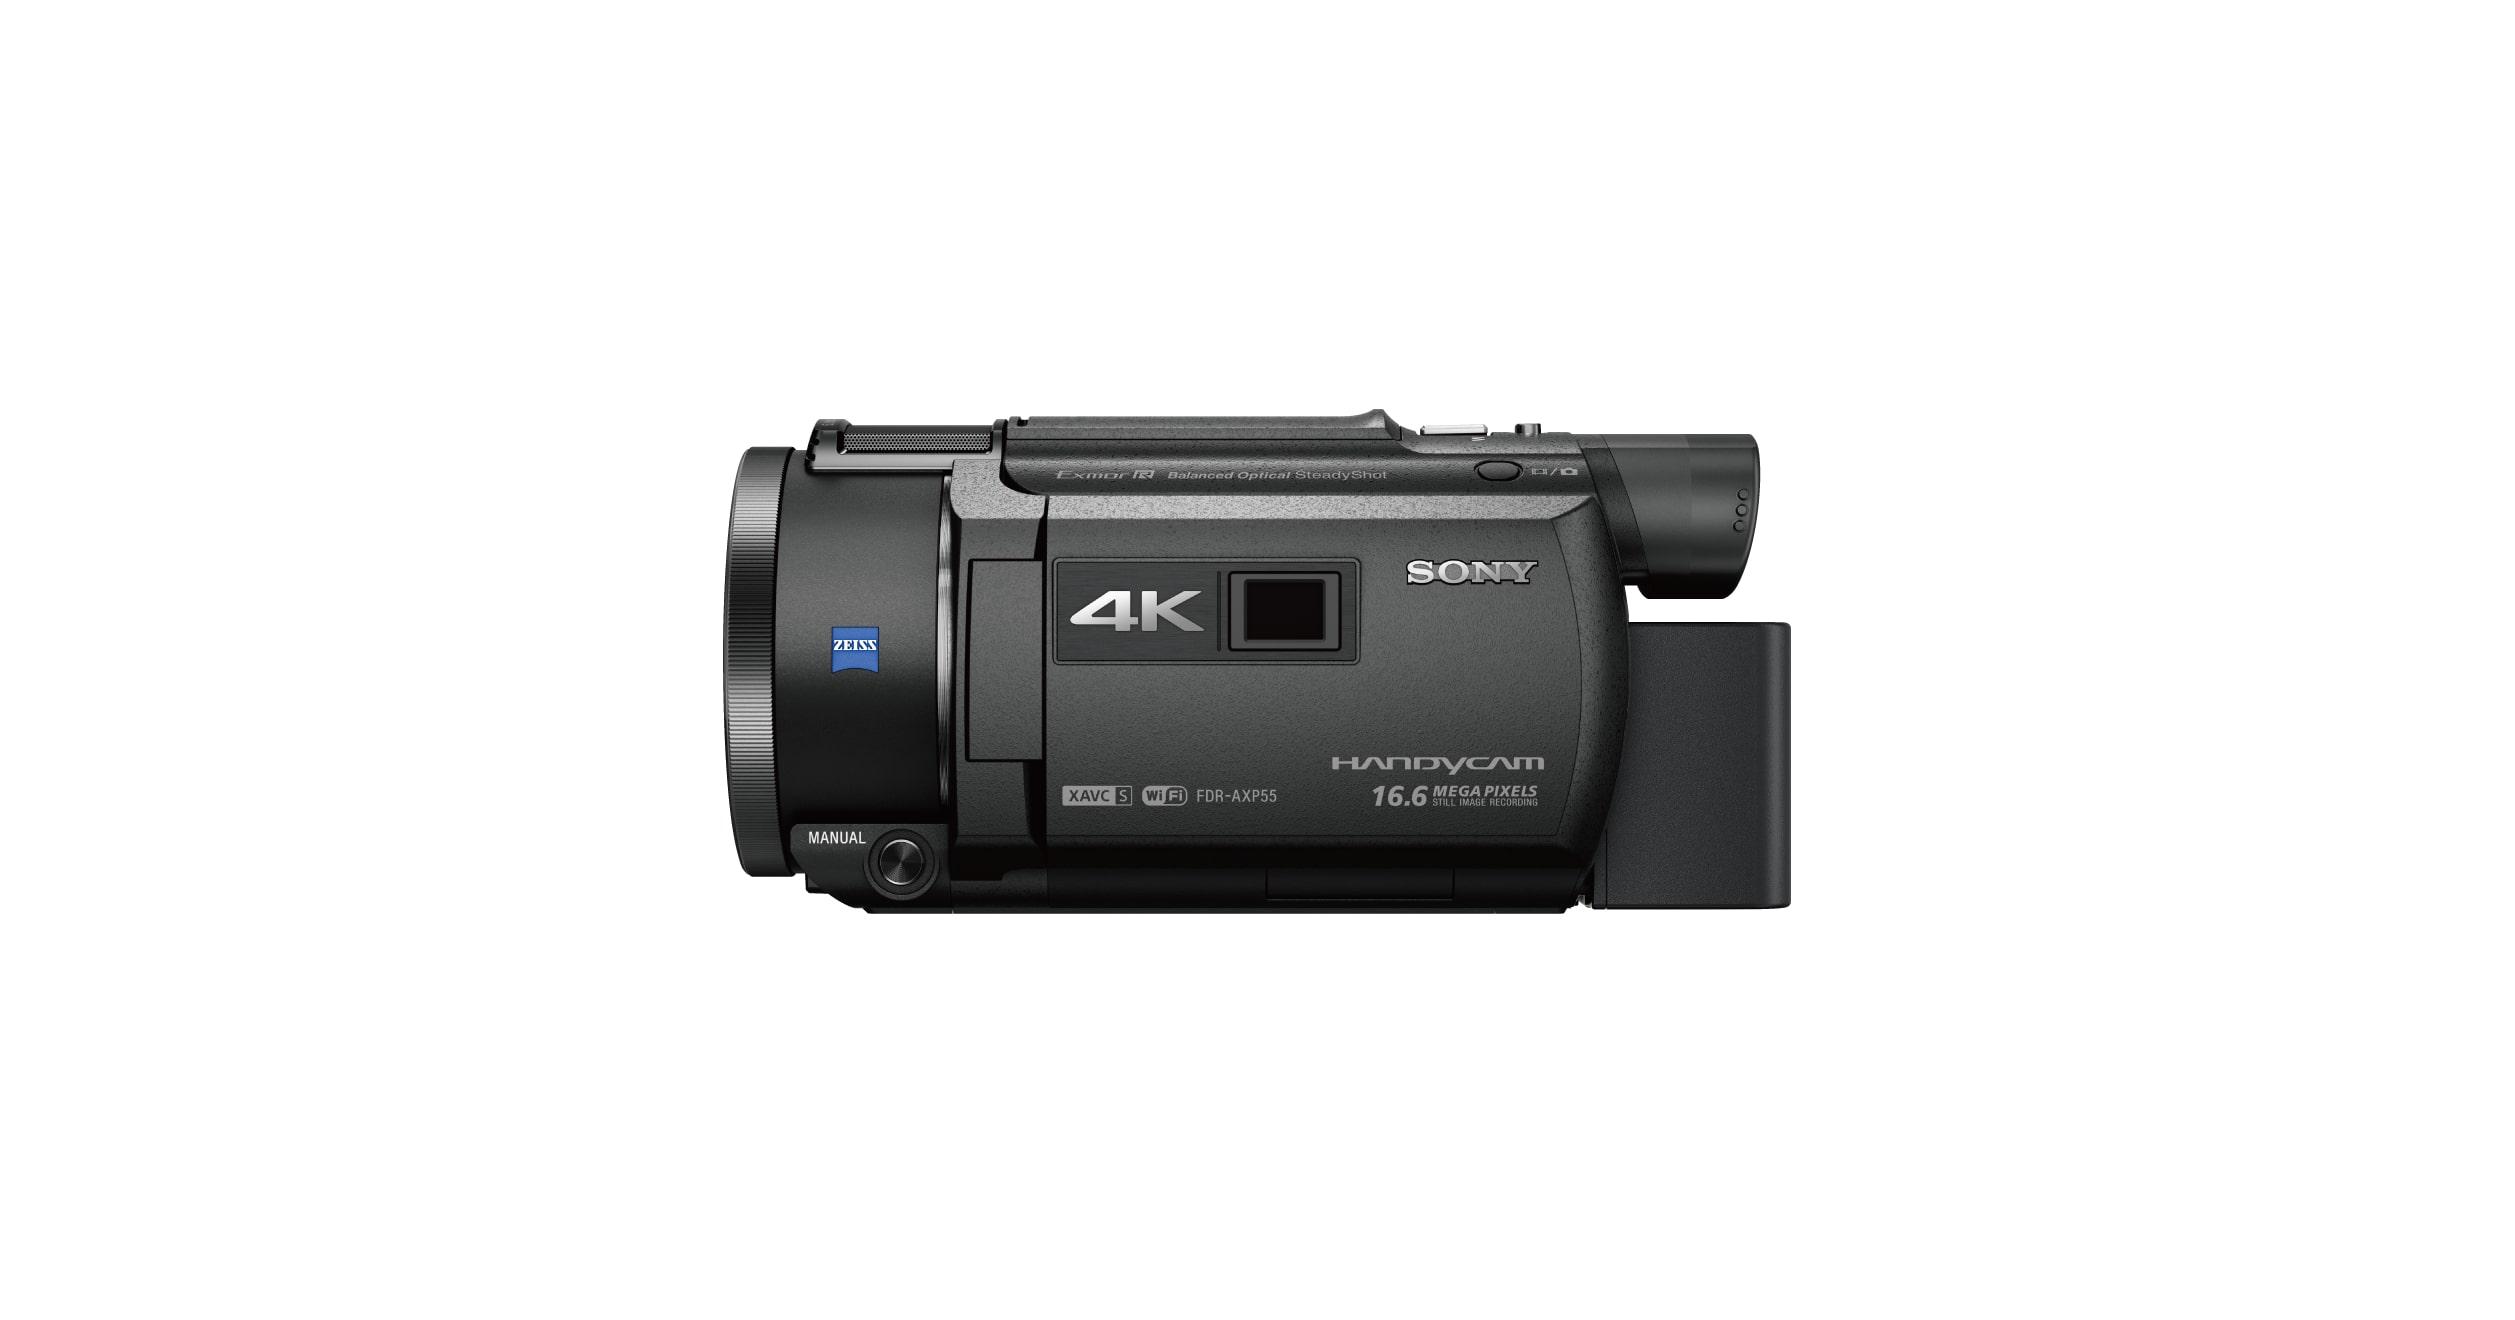 Sony AXP55 4K Handycam® with Built-in projector